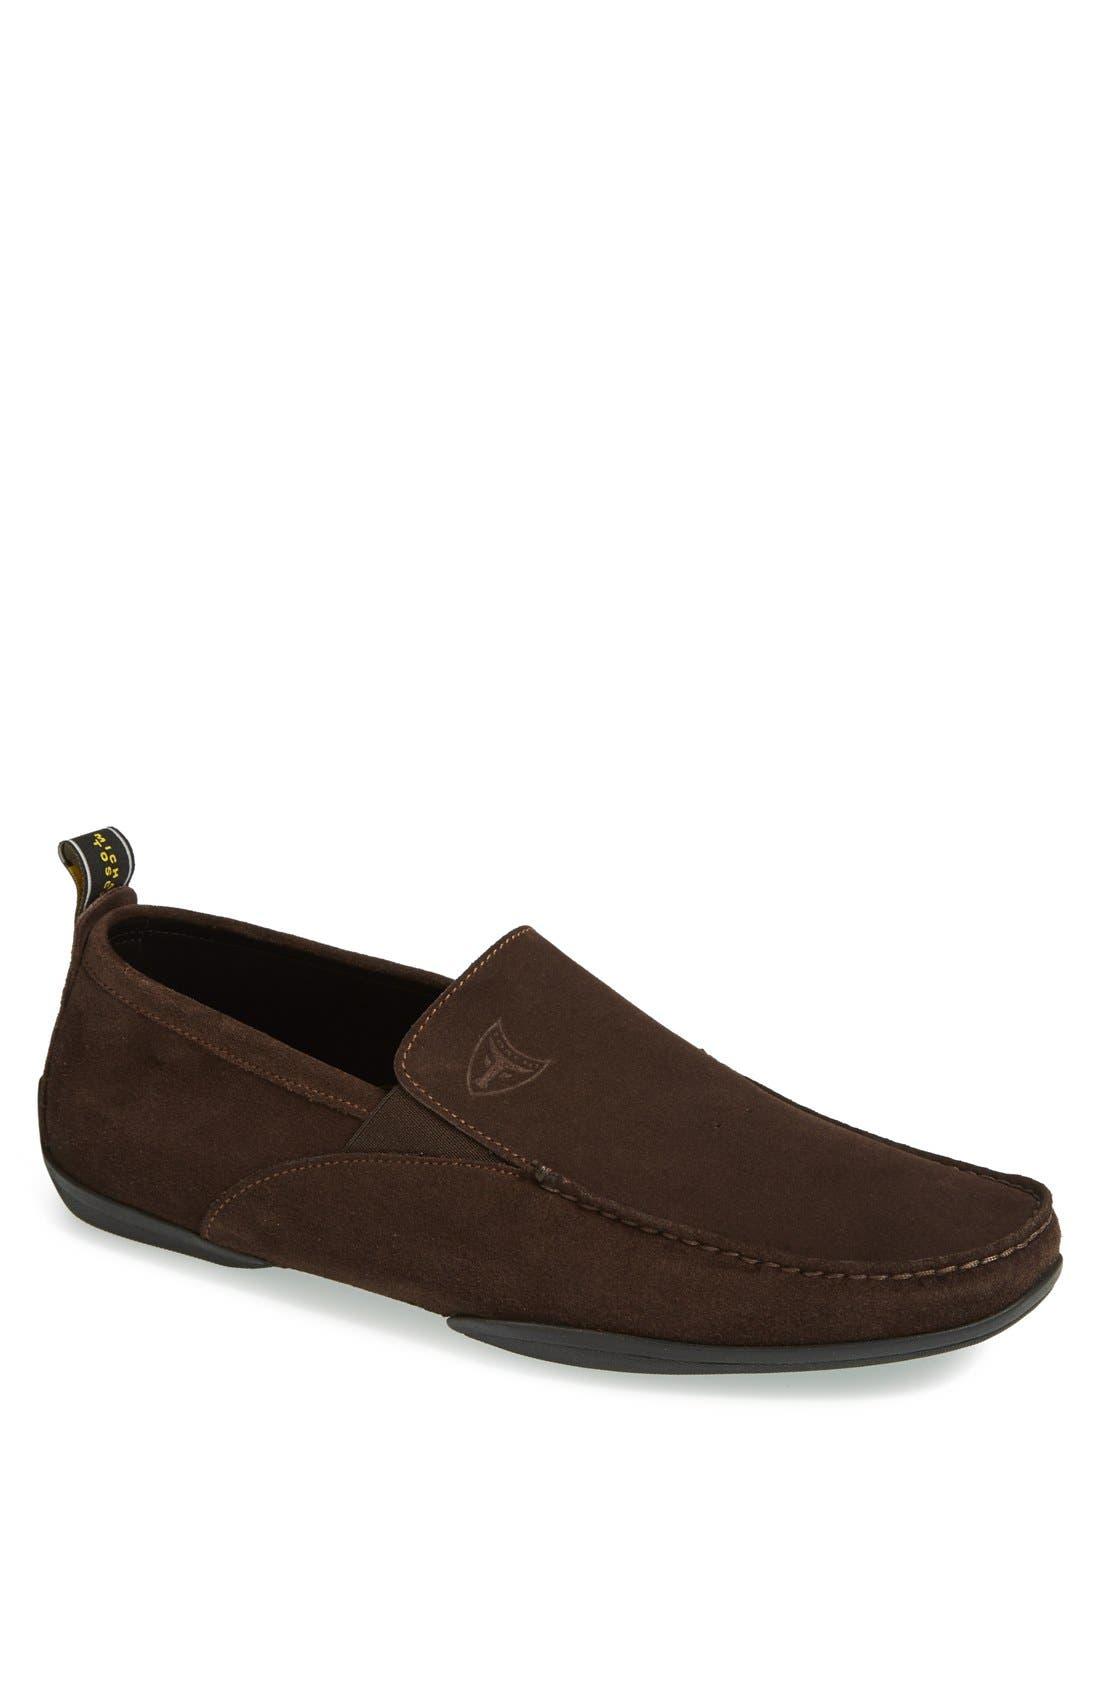 Alternate Image 1 Selected - Michael Toschi 'Onda' Low Profile Shoe